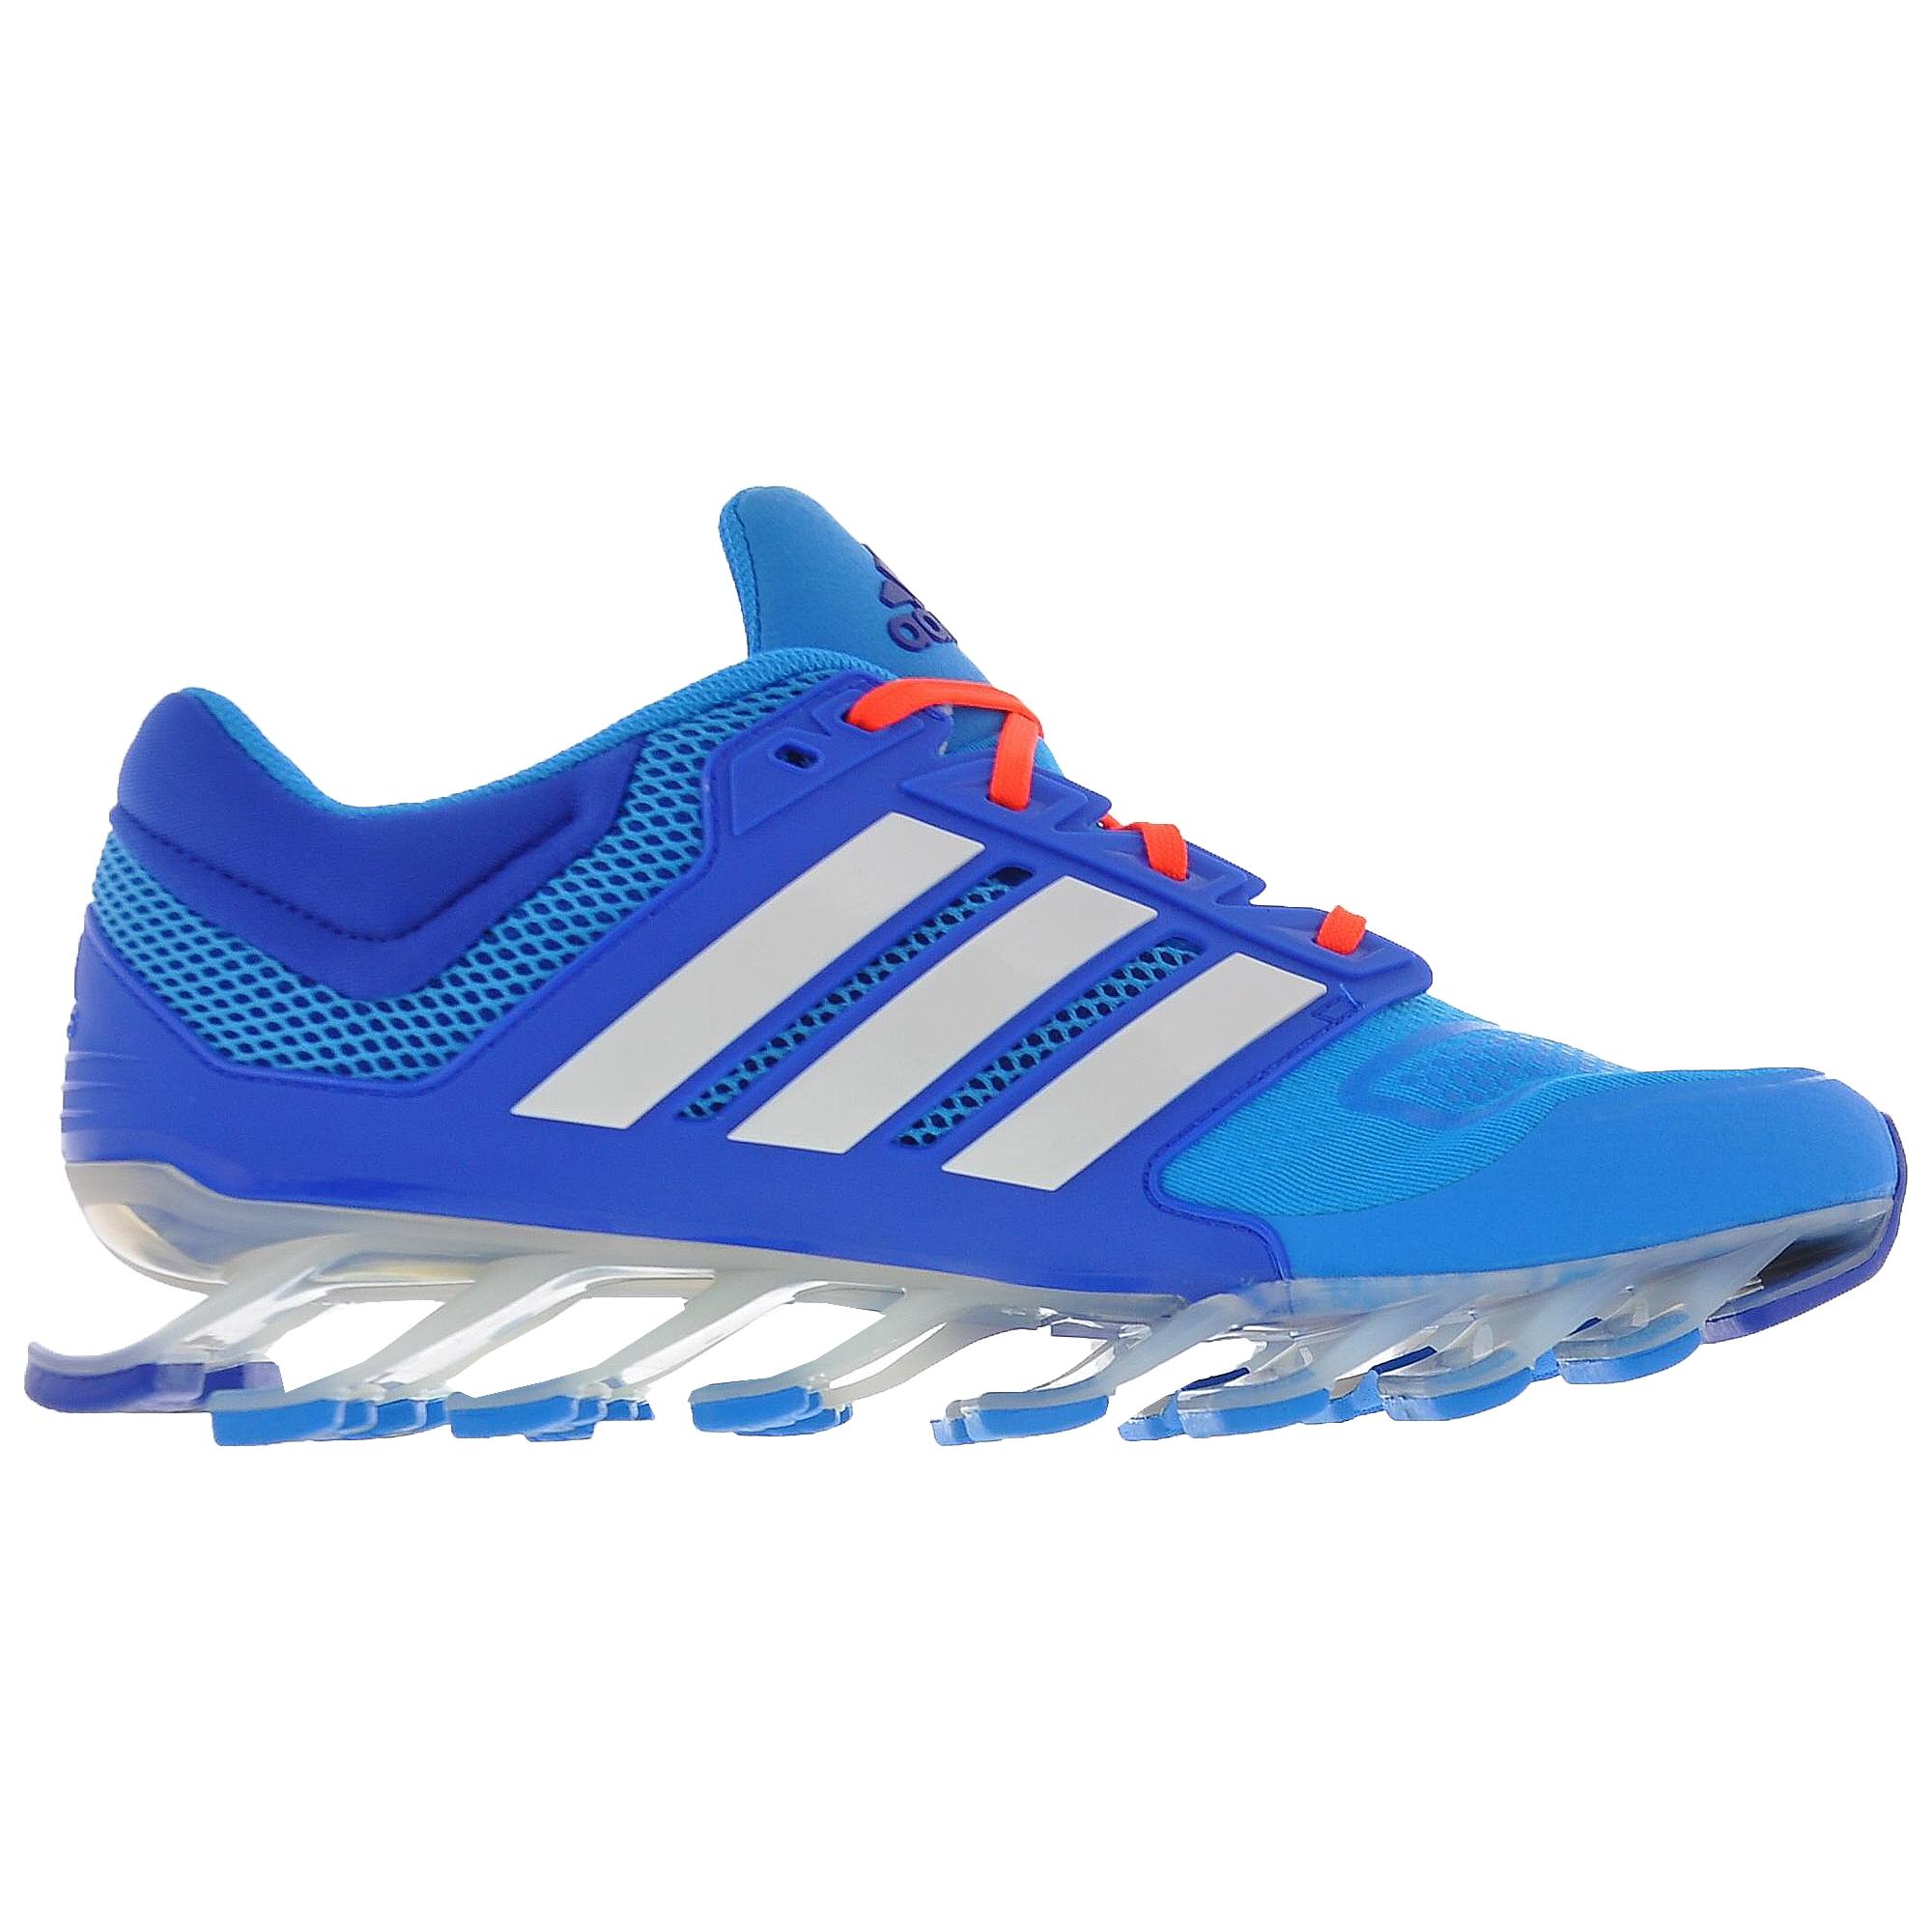 Adidas springblade 2